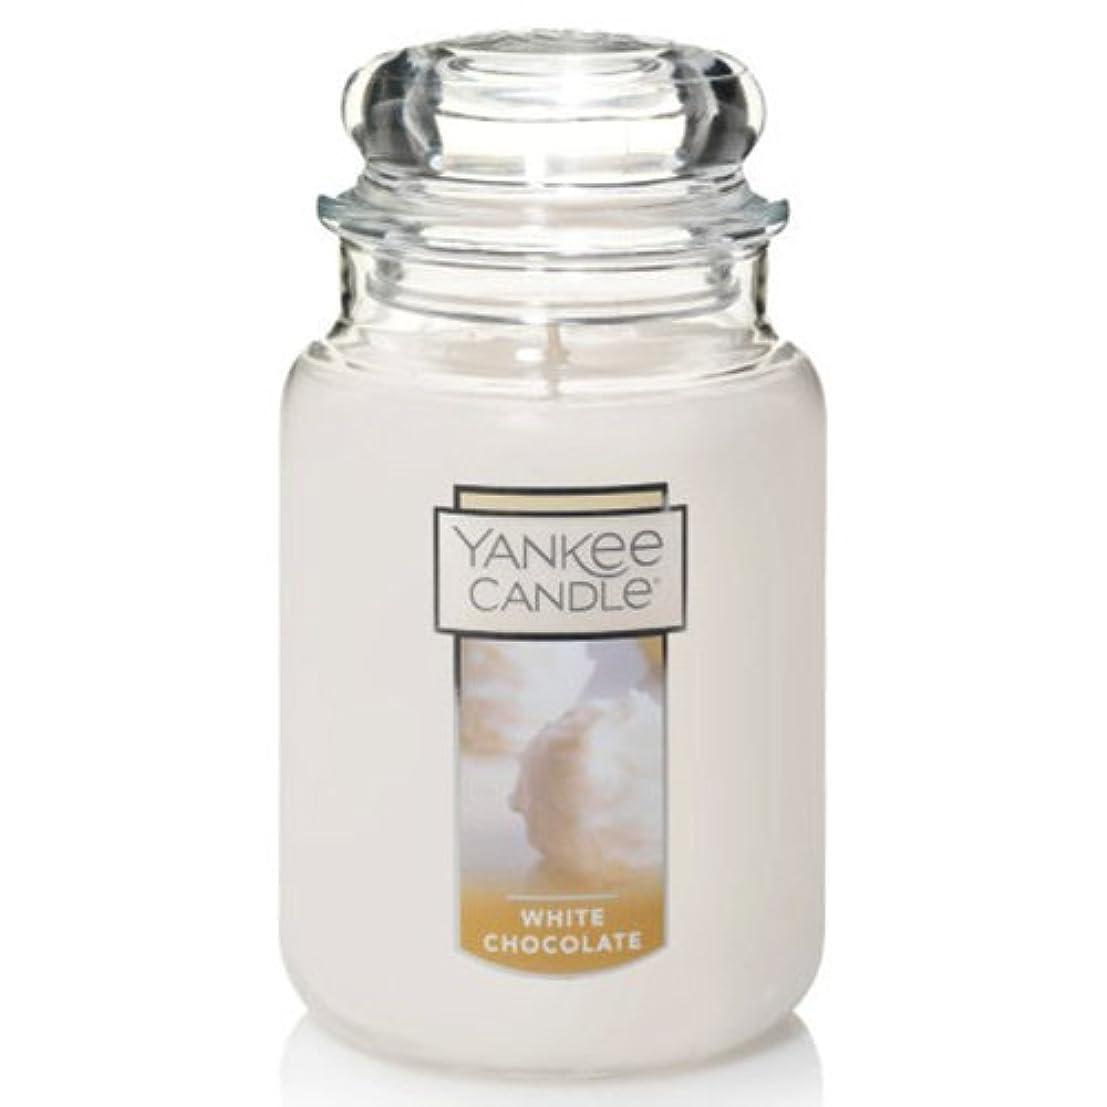 Yankee Candleホワイトチョコレート